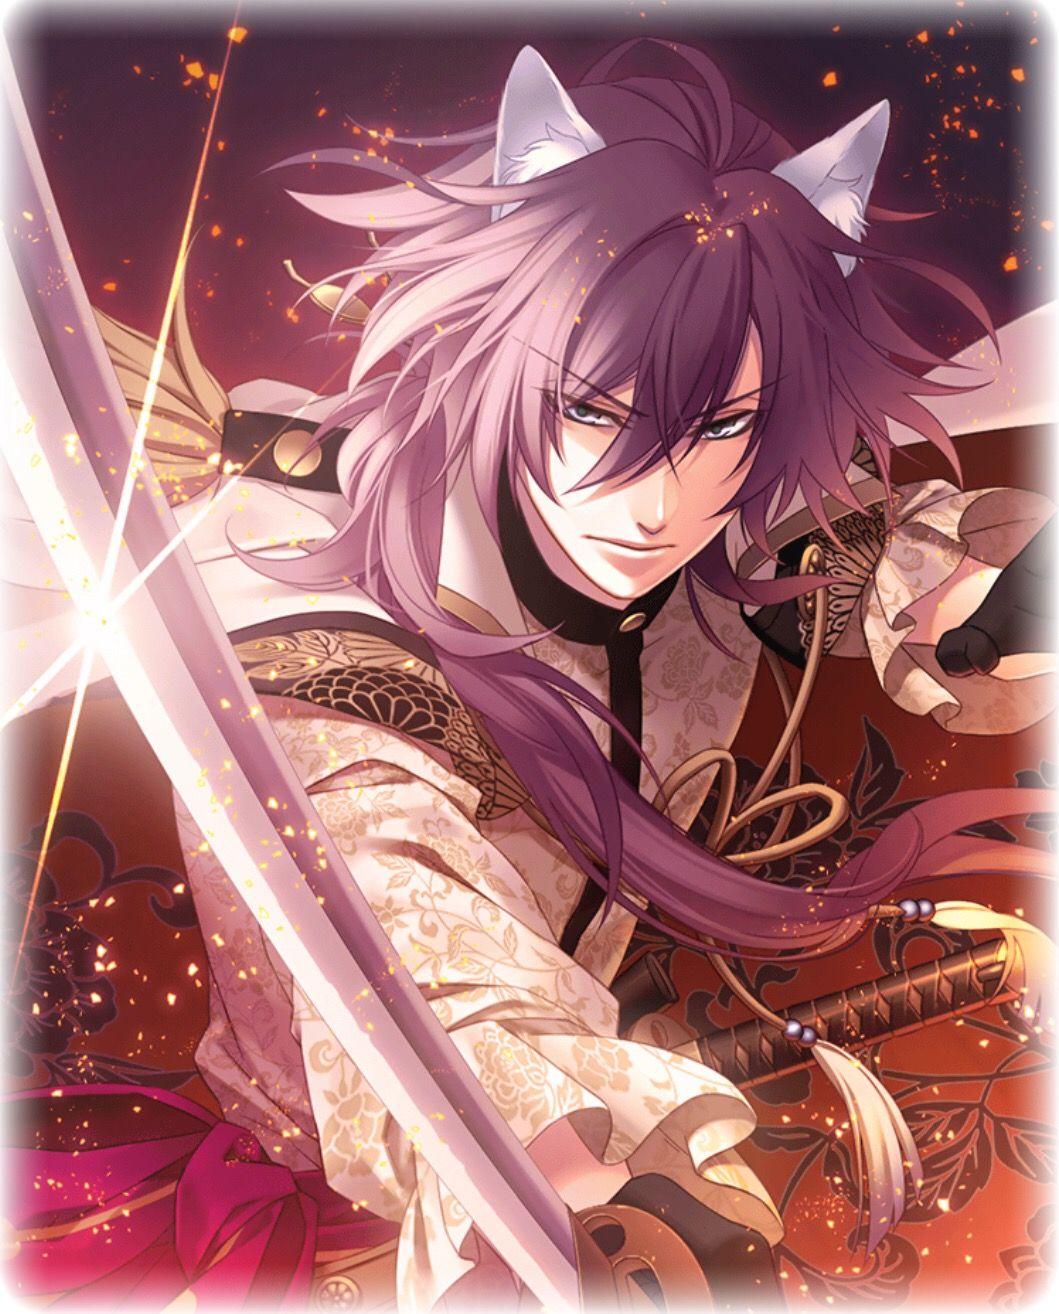 That Fierce Look Cute Anime Guys Hot Anime Boy Anime Wolf